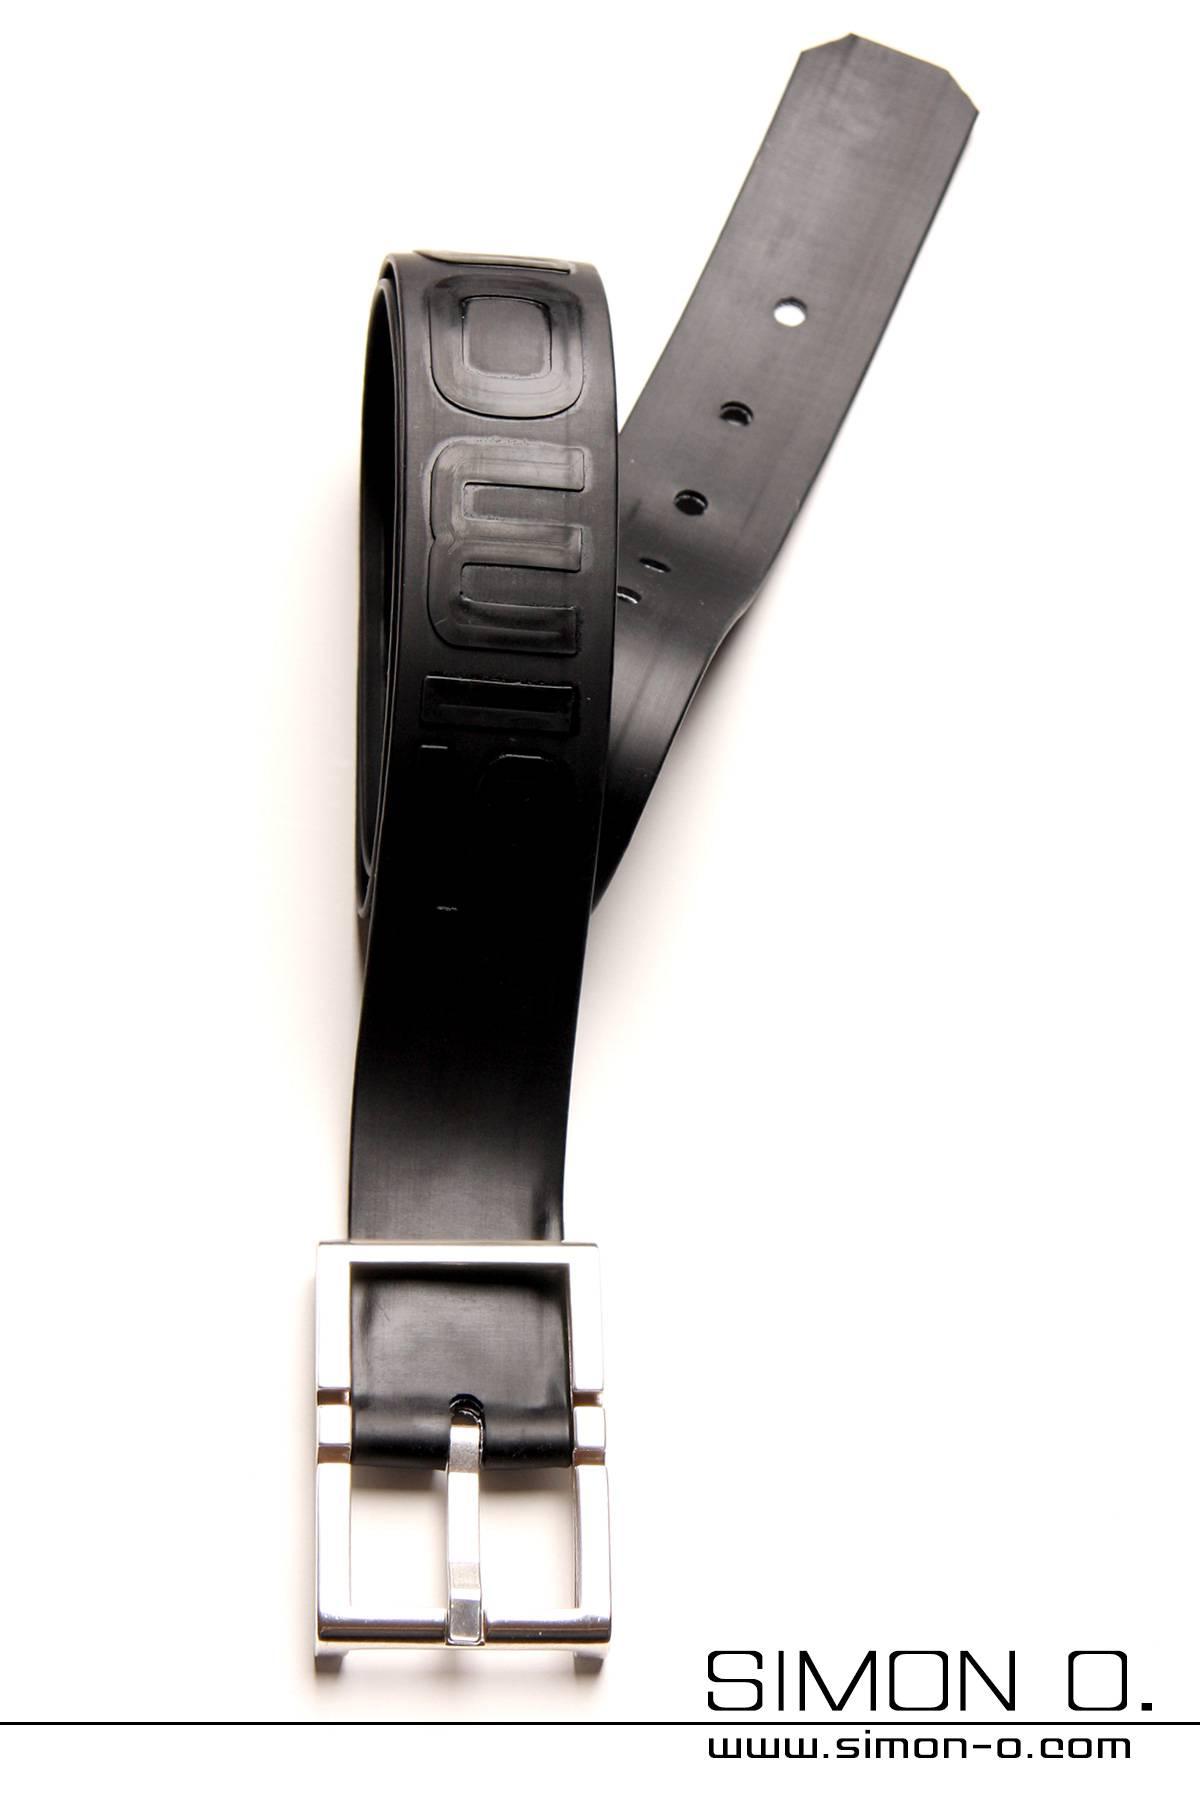 Schwarzer Latex Gürtel mit SIMON O. Schriftzug